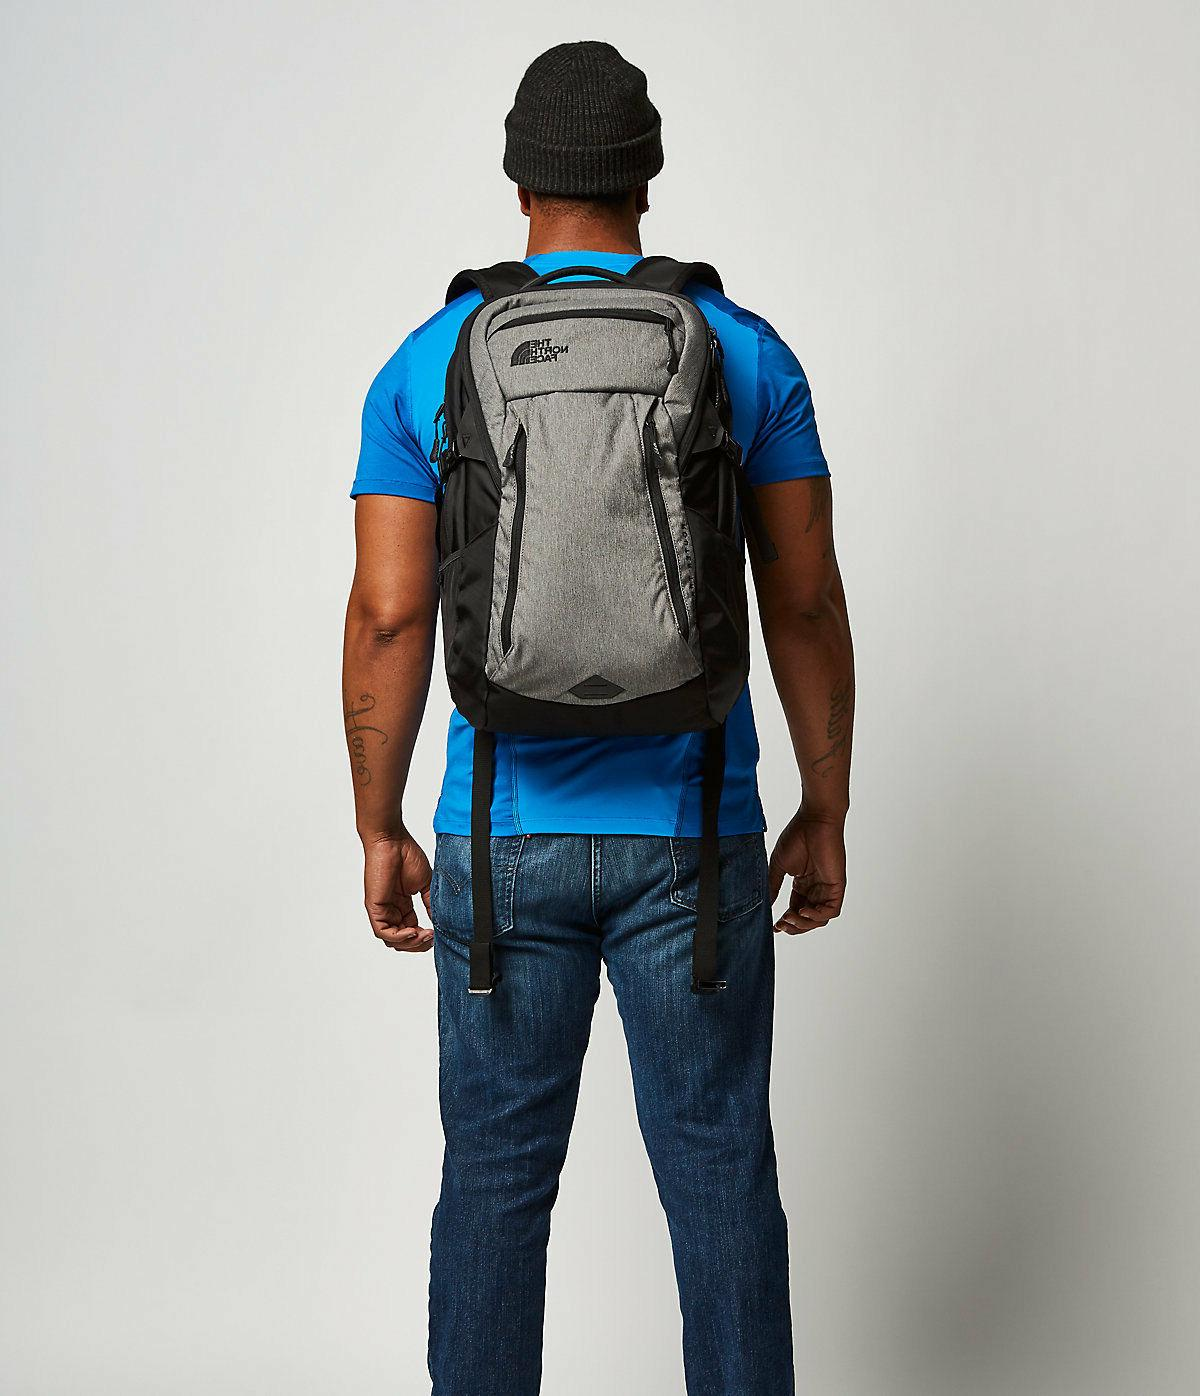 The Face Transit Backpack TSA Friendly 41L